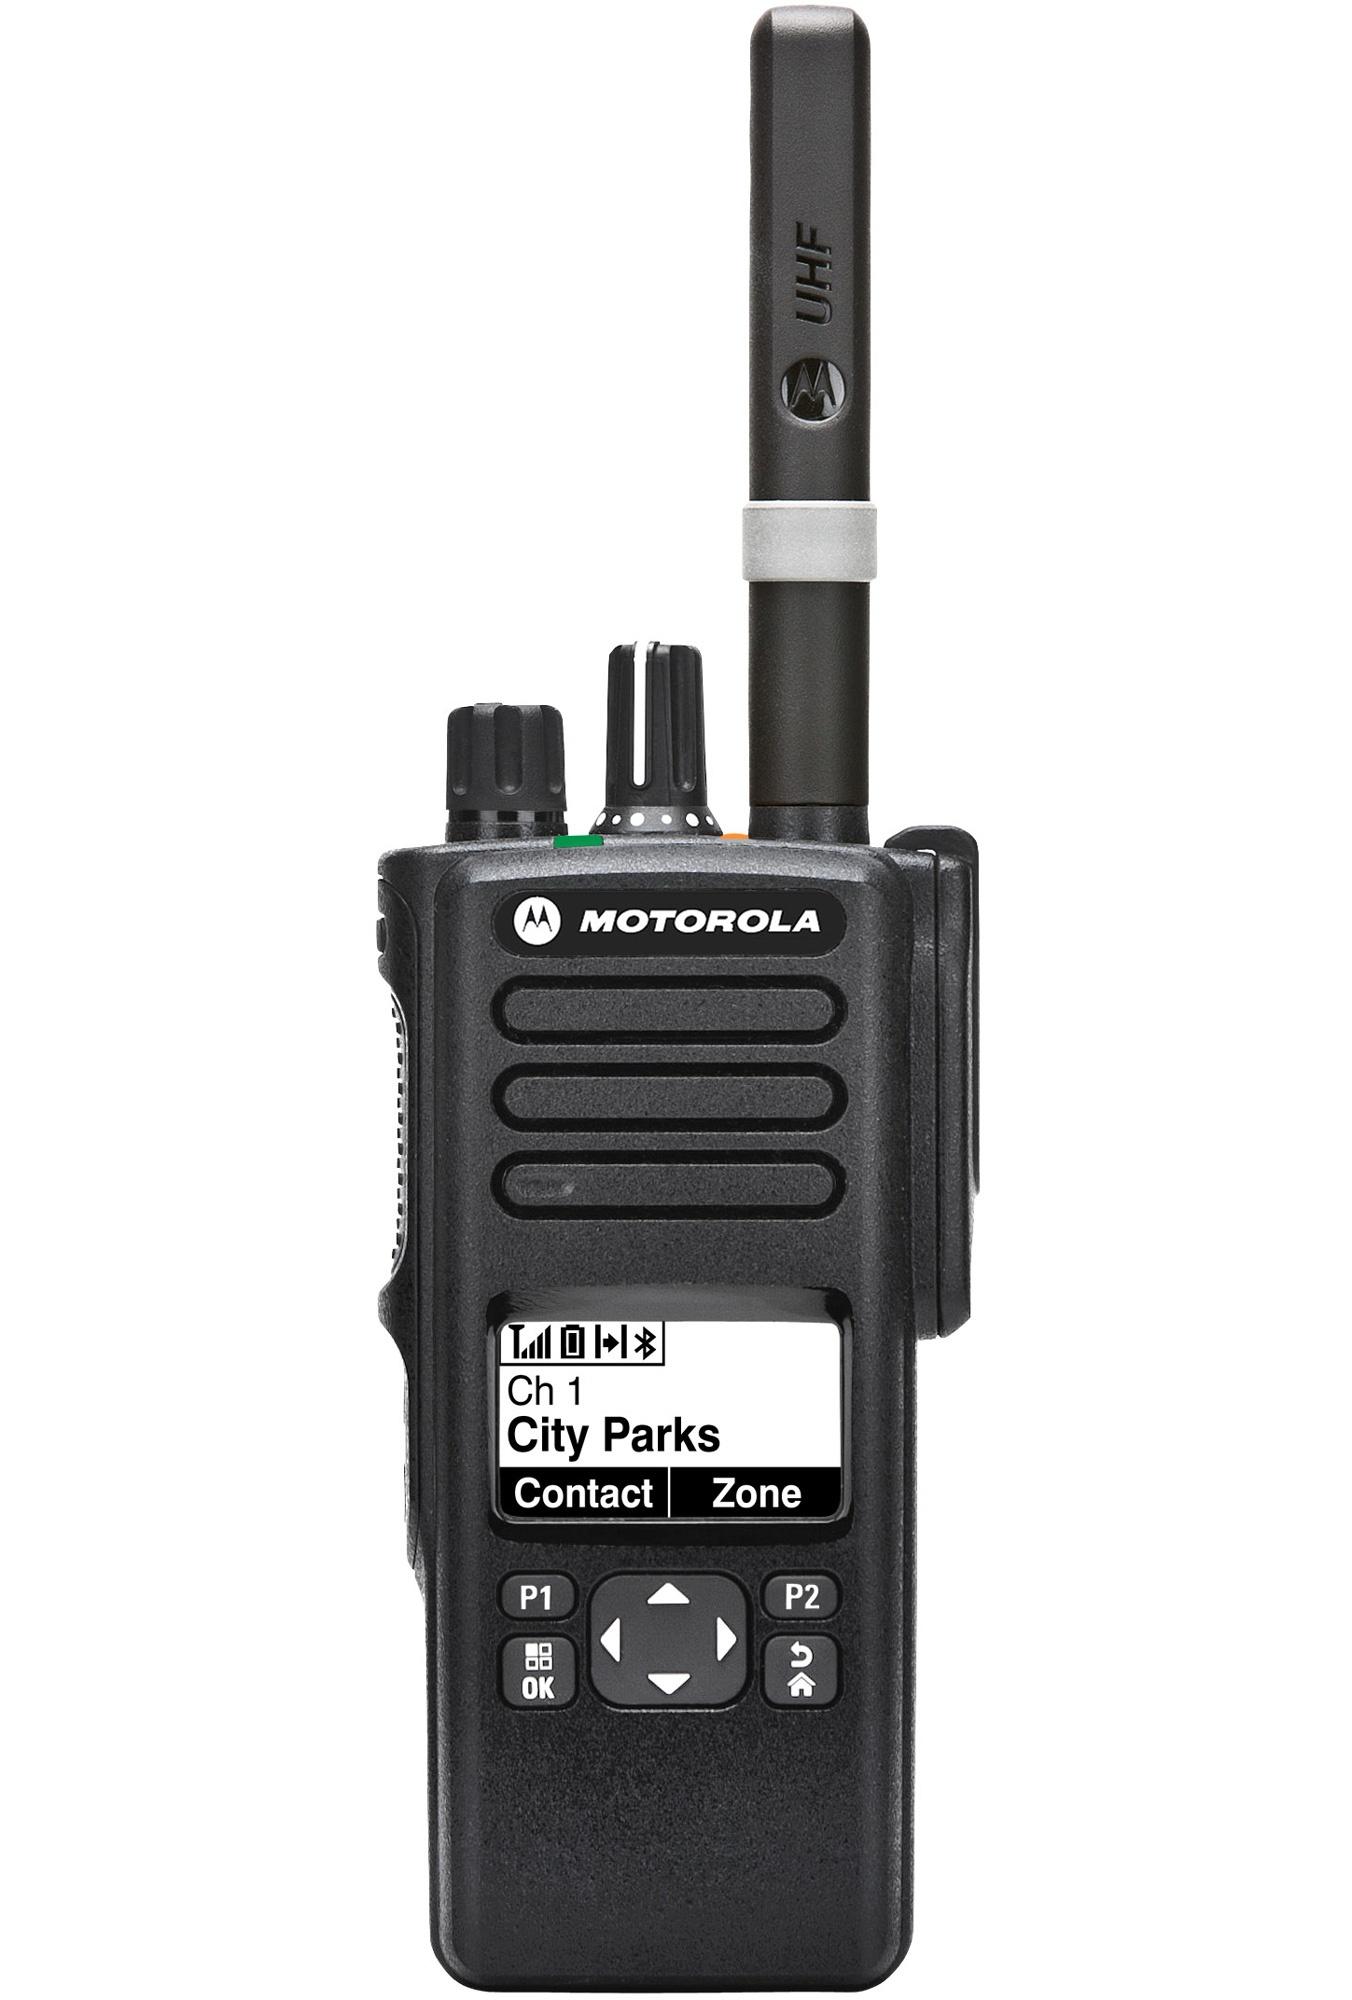 Motorola Walkie Talkie Two Way Radio